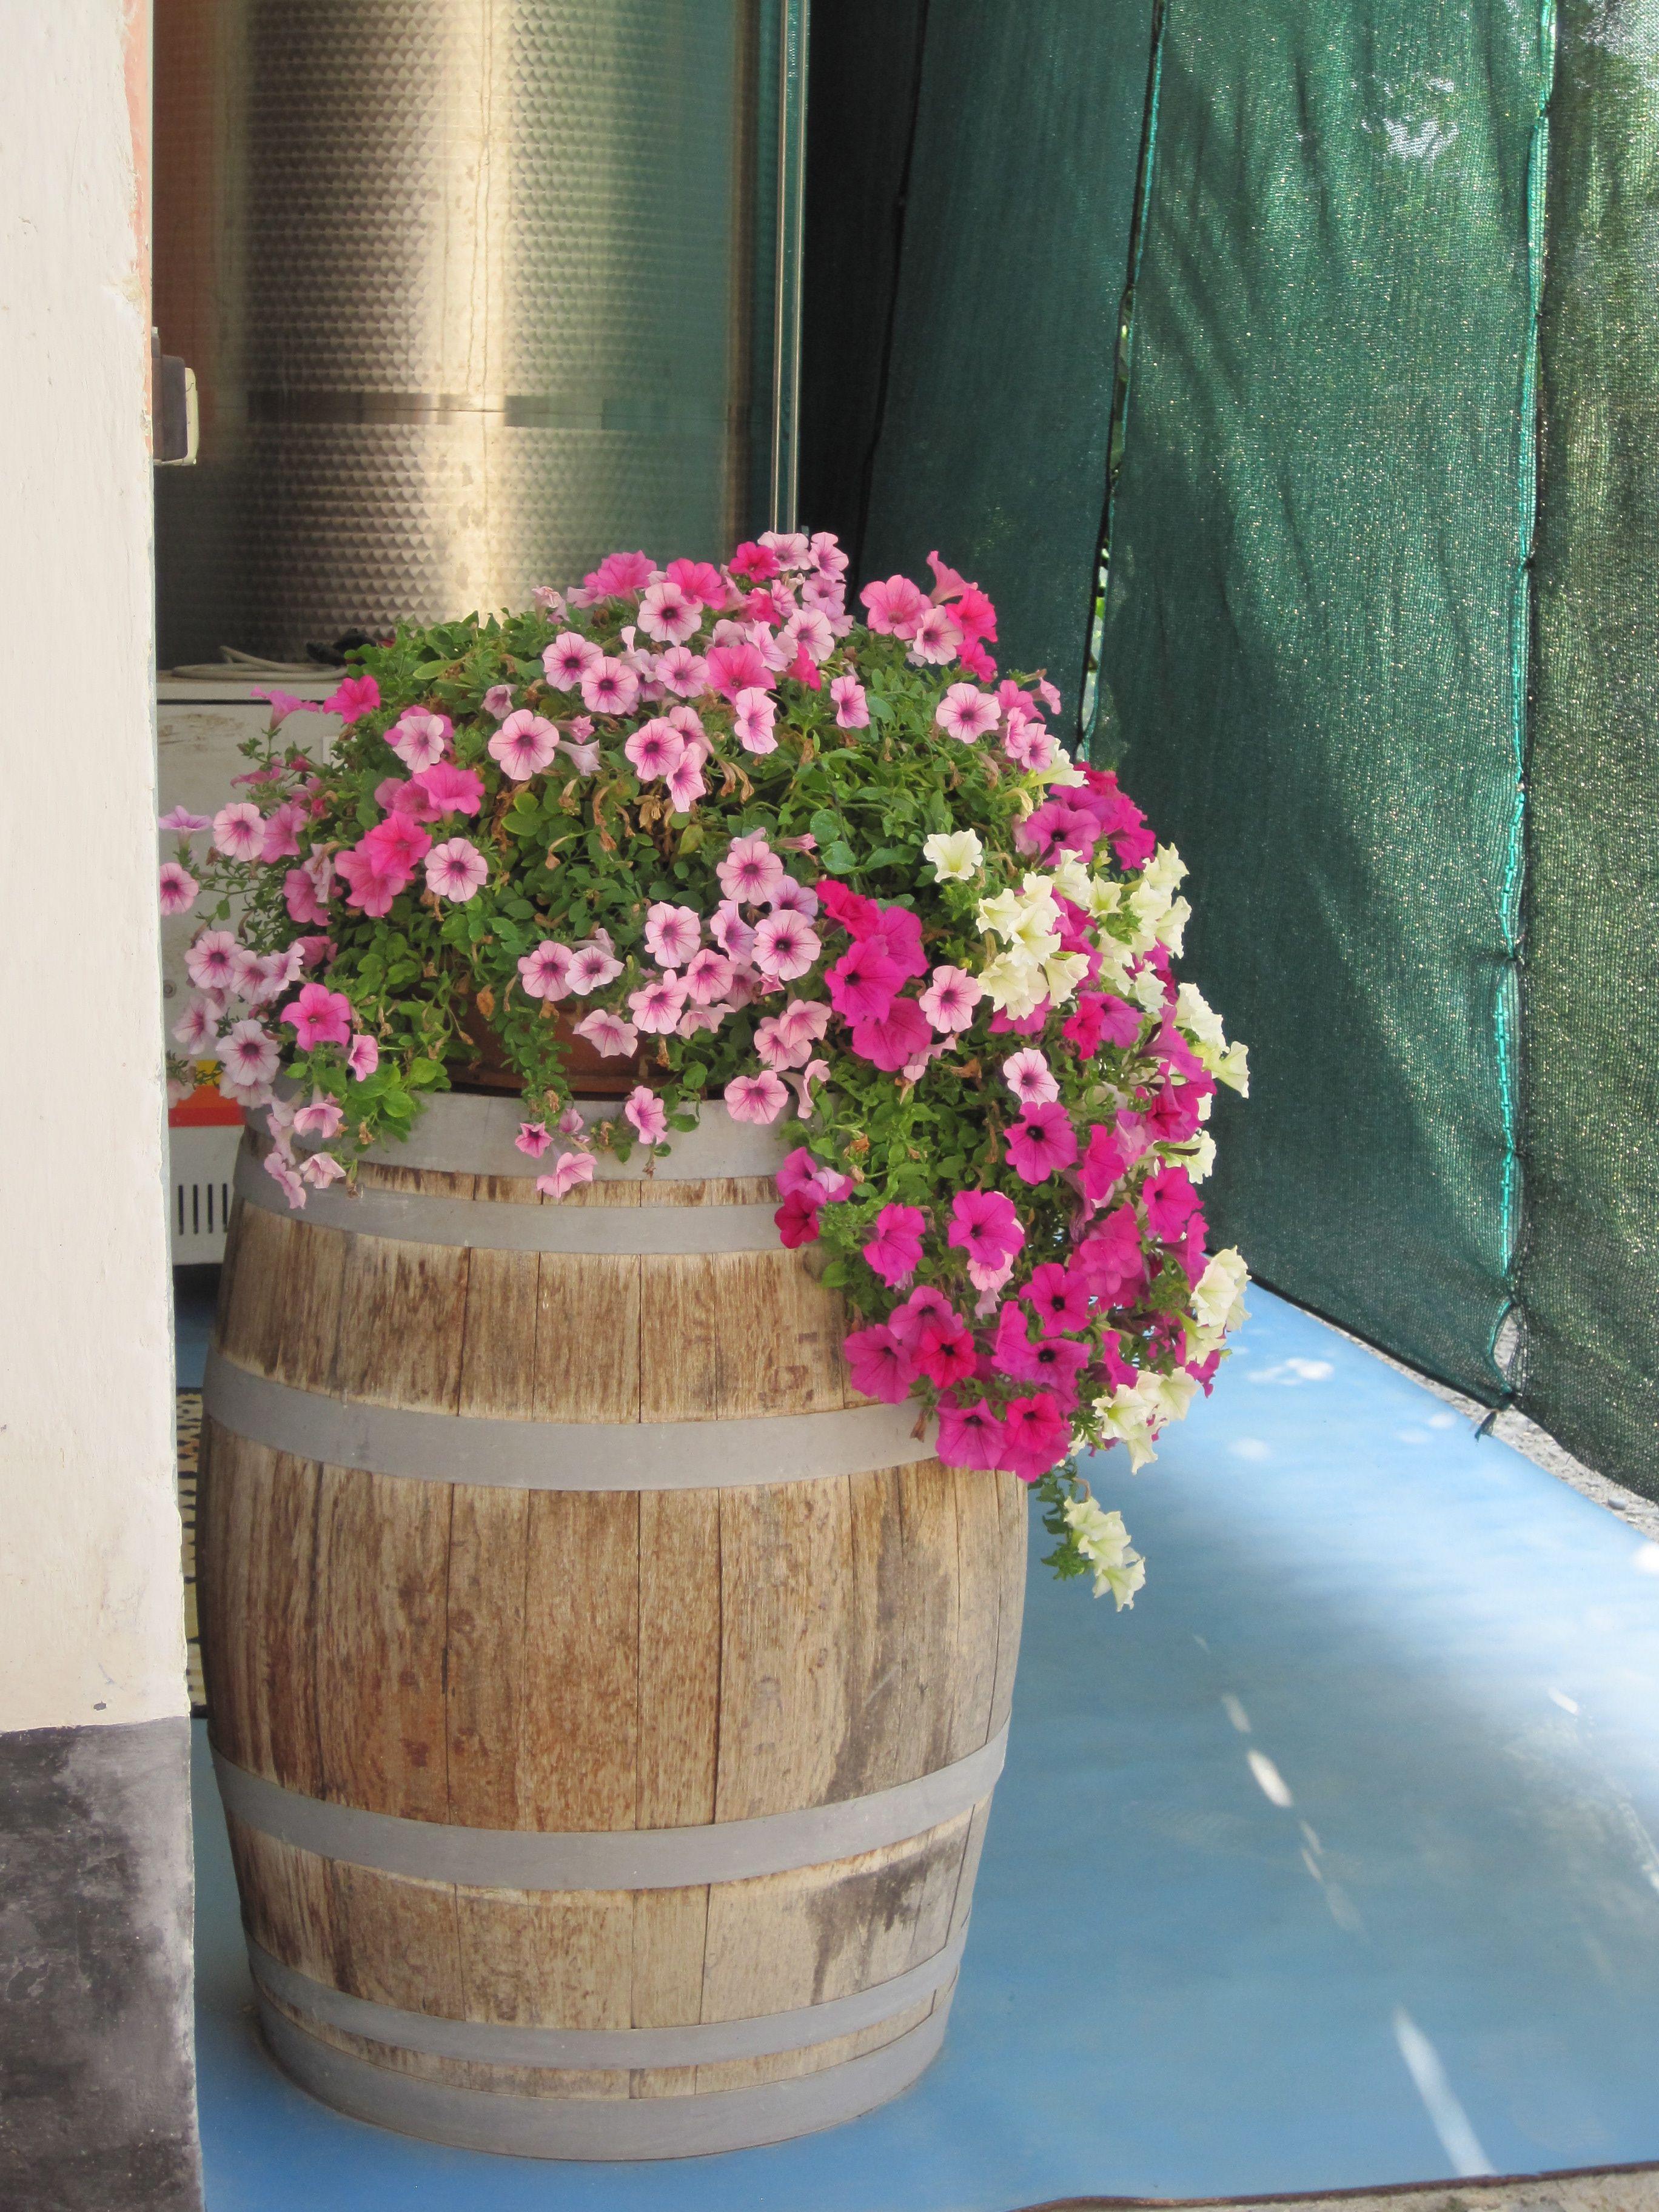 Wine barrel planter gardening so many ideas so little for Diy wine barrel planter